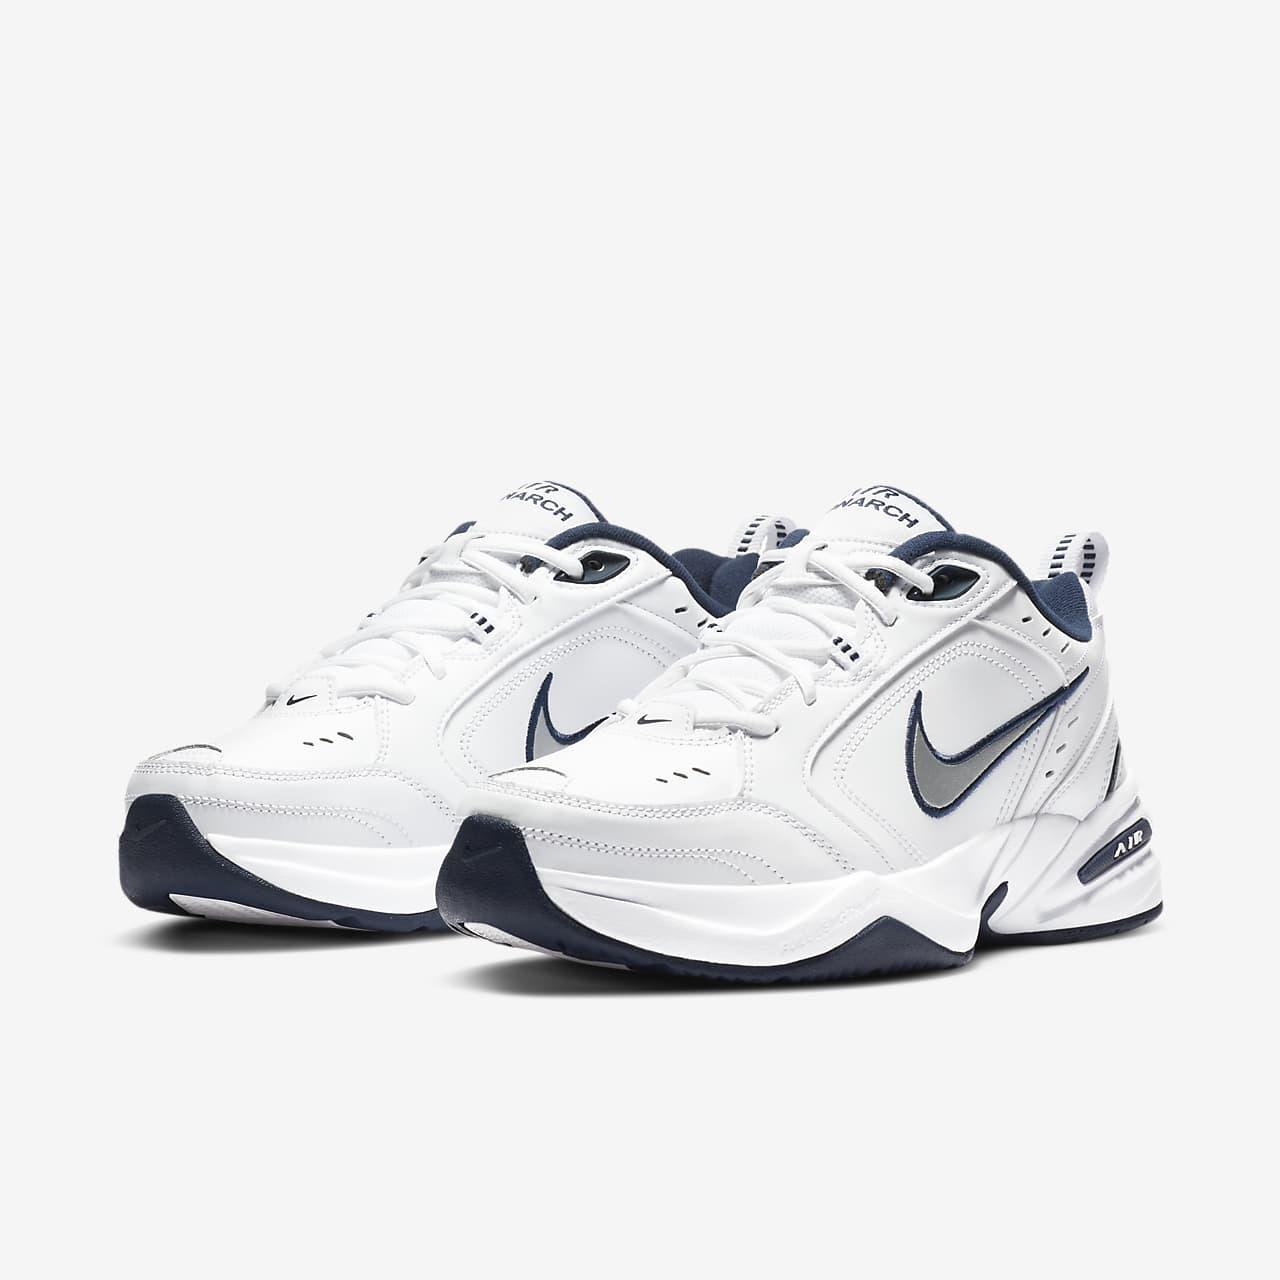 Nike Air Monarch Iv, Chaussures de Gymnastique Homme, Blanc (White/Metallic Silver 102), 44 EU